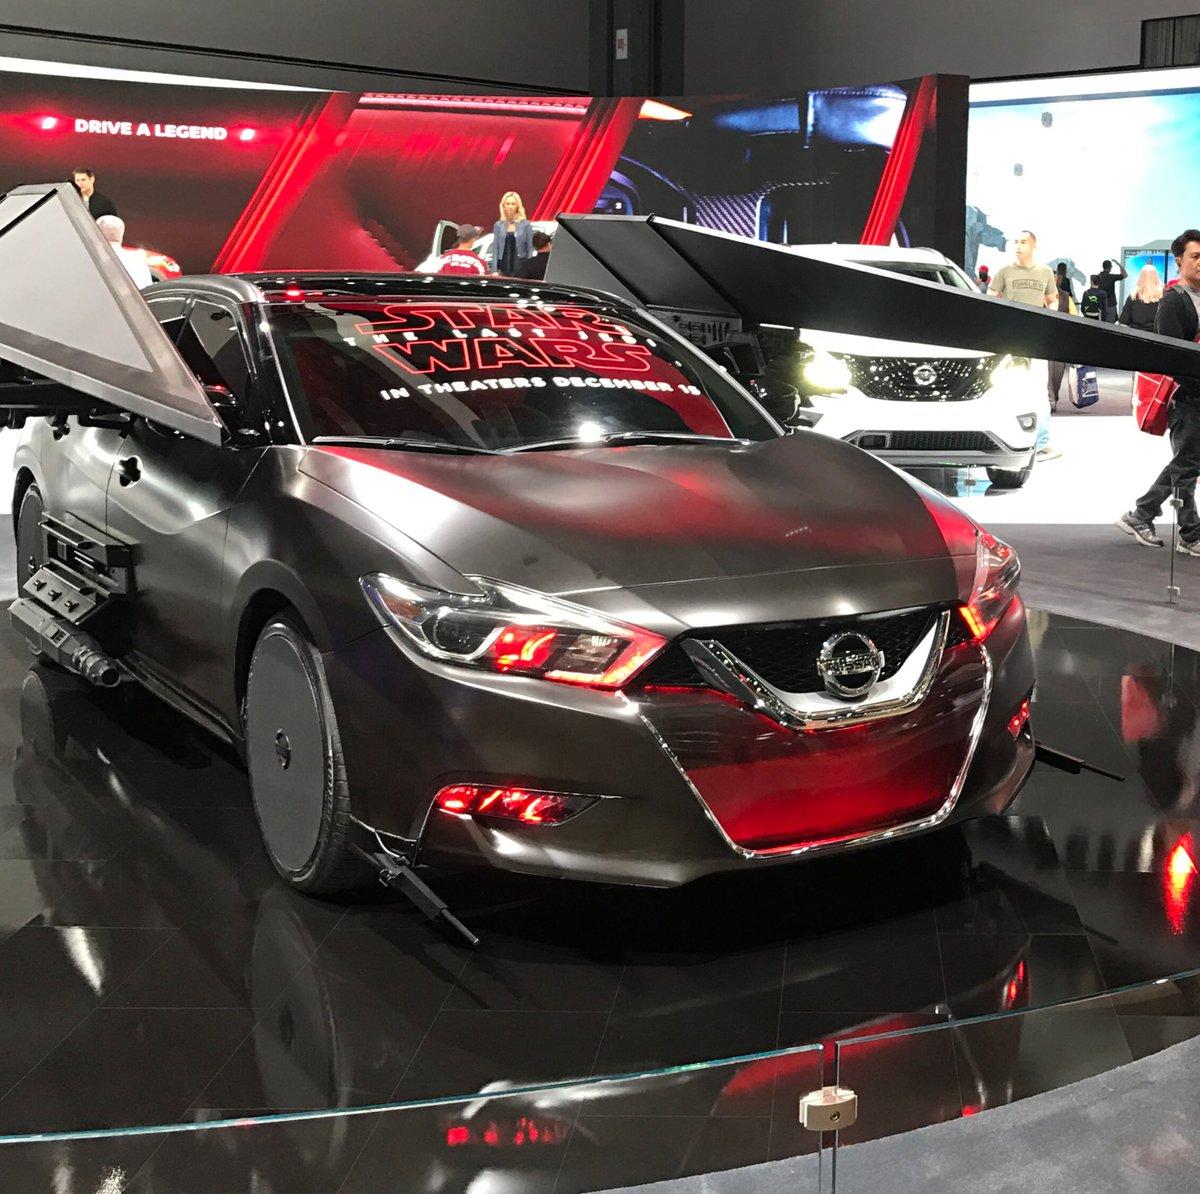 Digital La La Auto Show Features Ar Vr Star Wars Cars